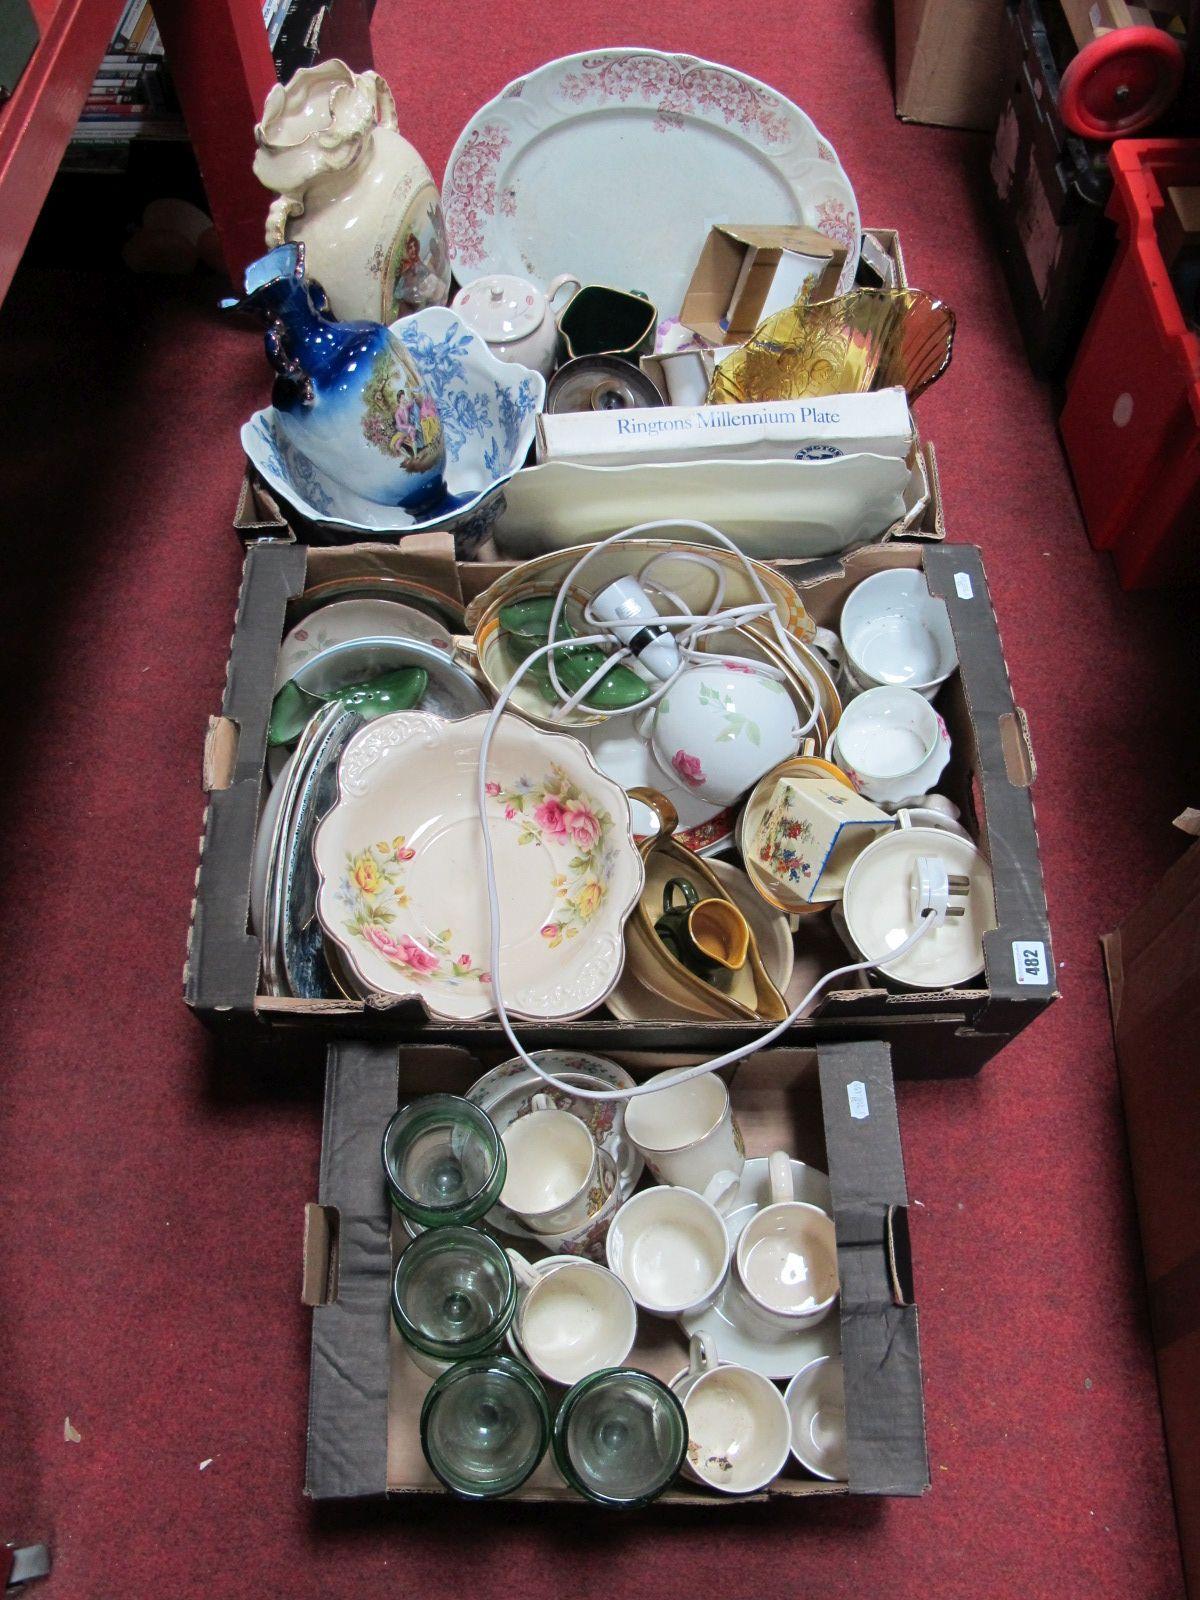 Lot 482 - An Early XX Century Vase, XIX Century meat plate, Ringtons Jubilee beakers, other commemorative